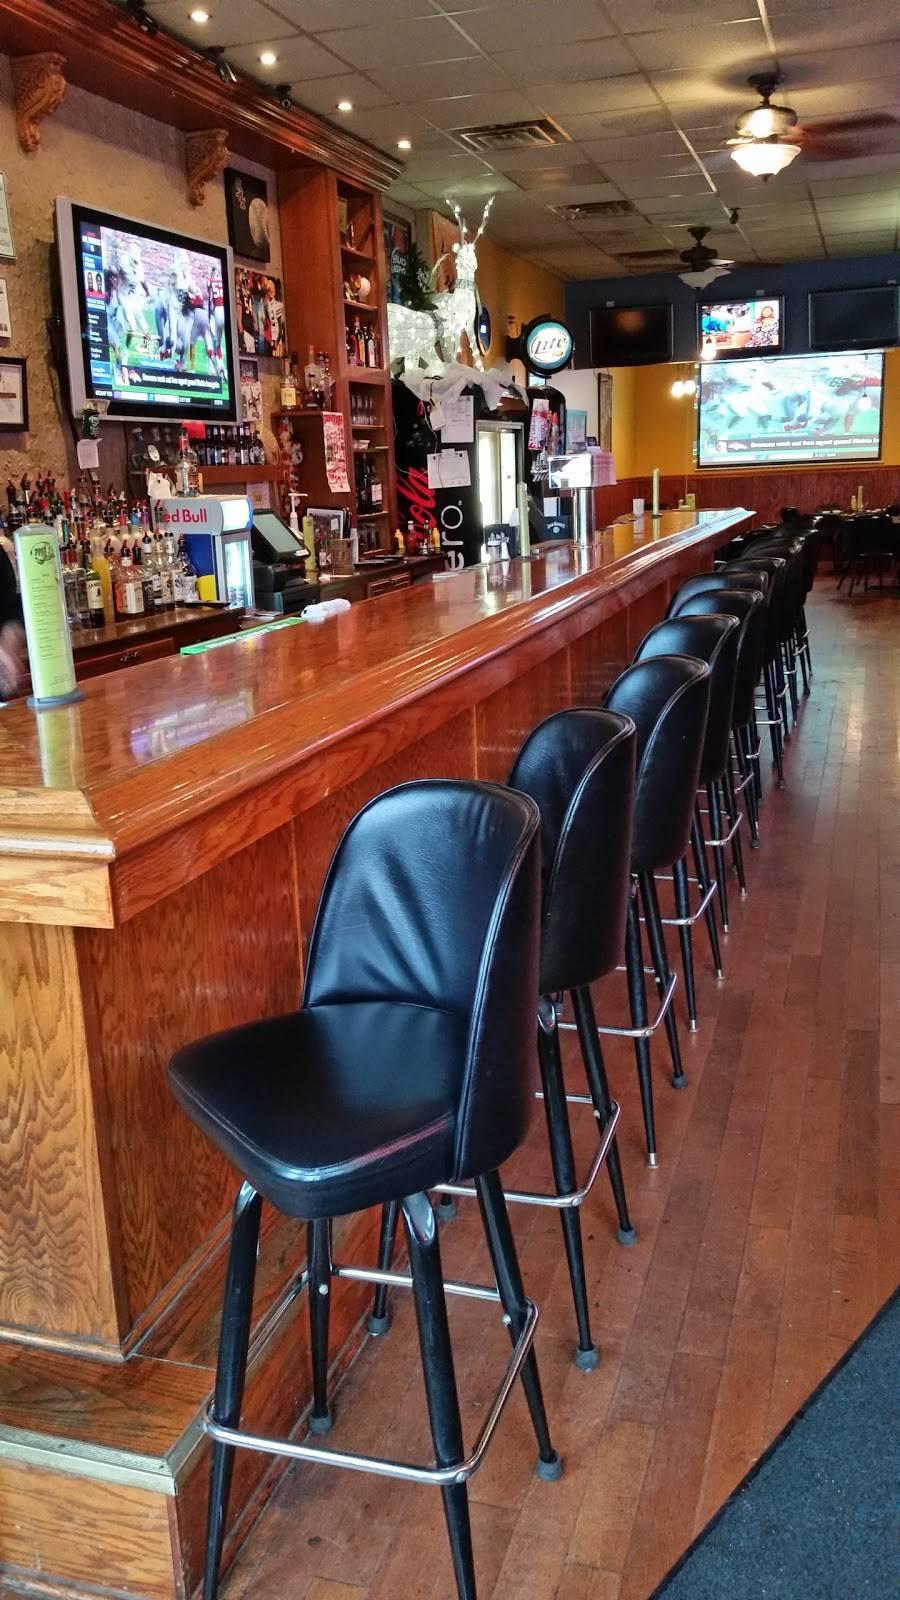 MJs Pub & Grill | restaurant | 139 E Walnut St, Oglesby, IL 61348, USA | 8158839782 OR +1 815-883-9782